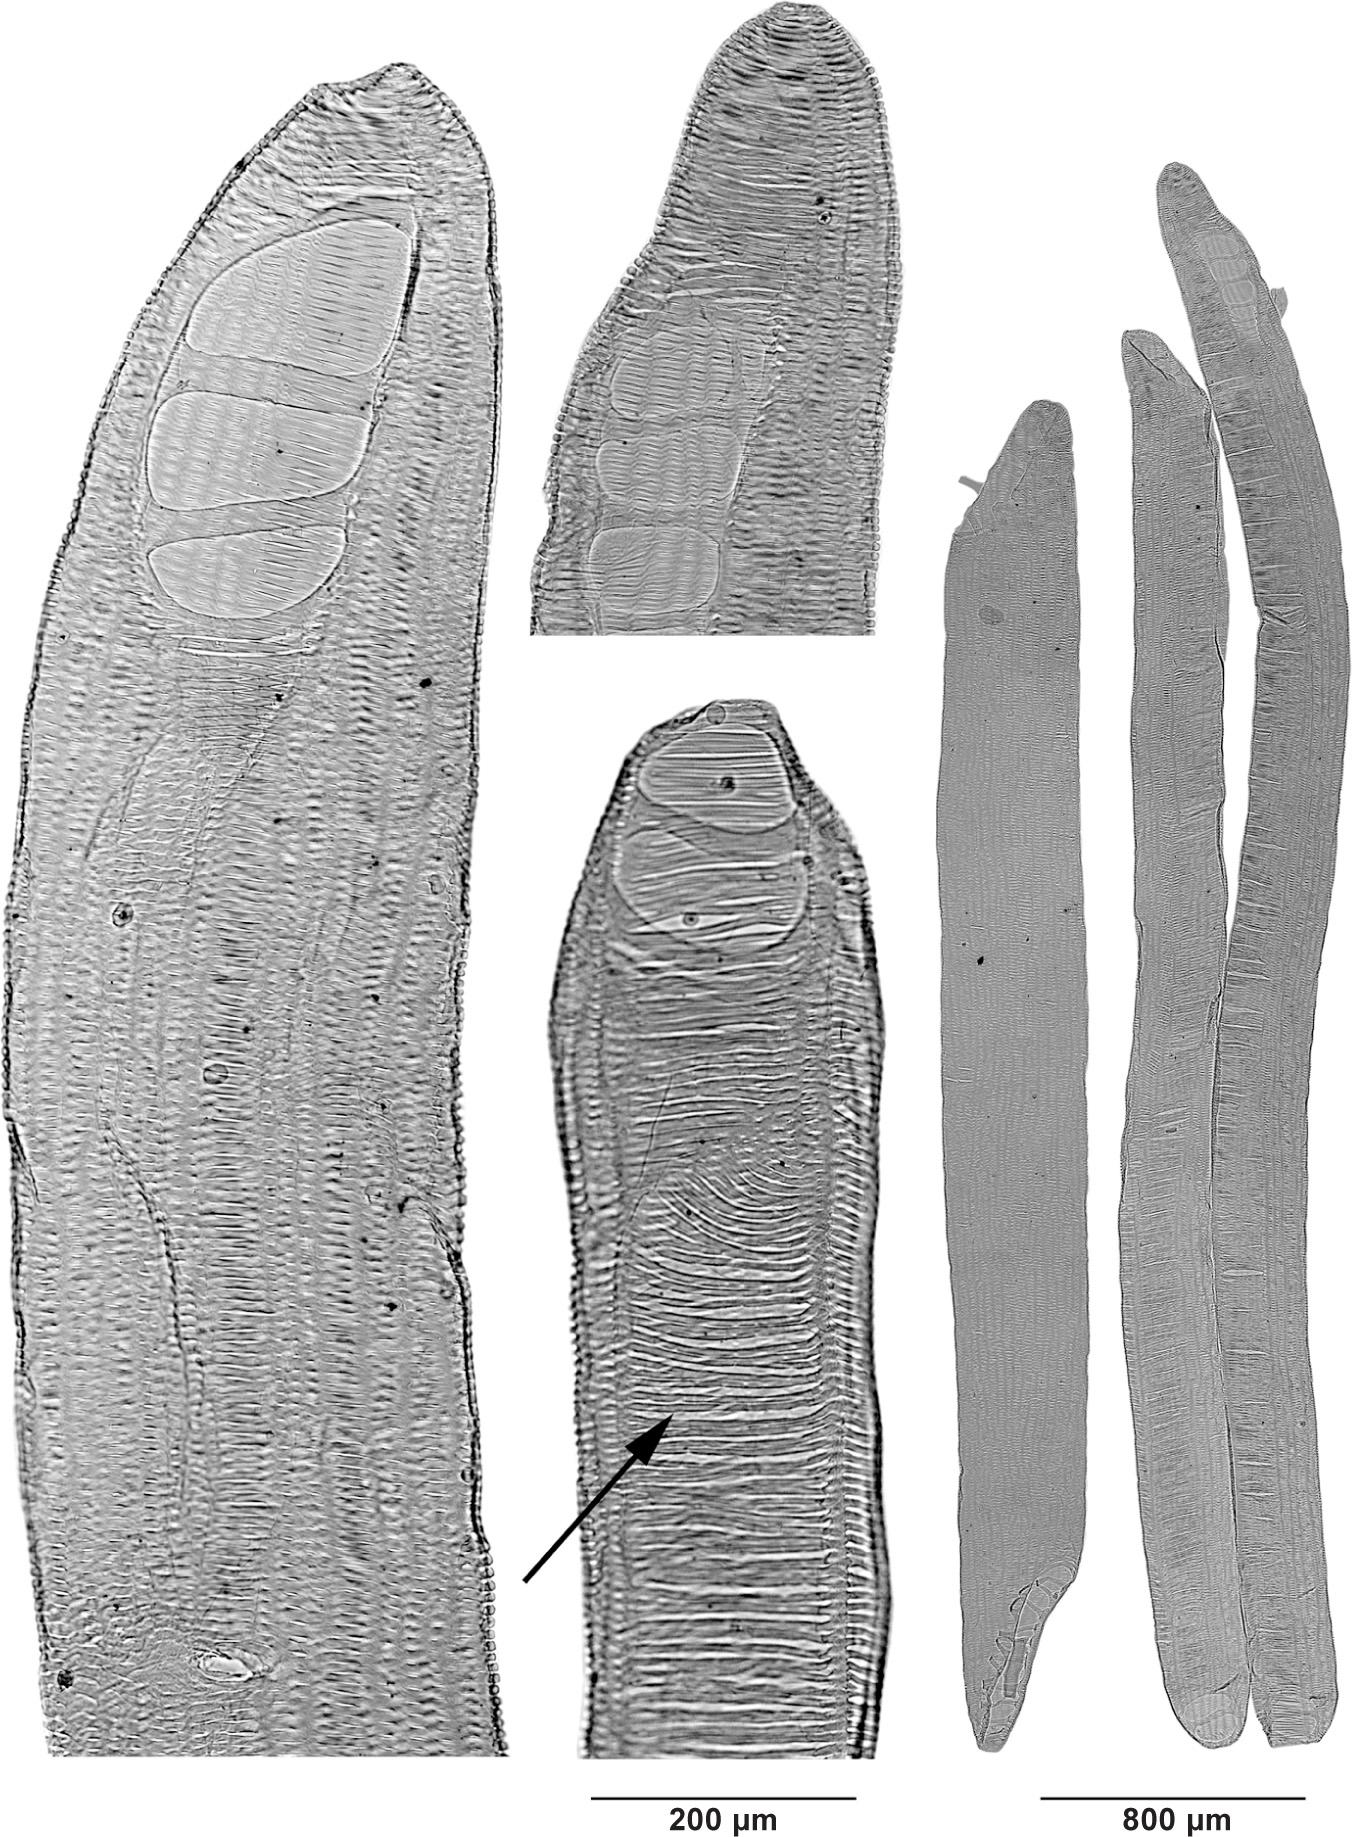 ATLAS OF VESSEL ELEMENTS in: IAWA Journal Volume 39 Issue 3